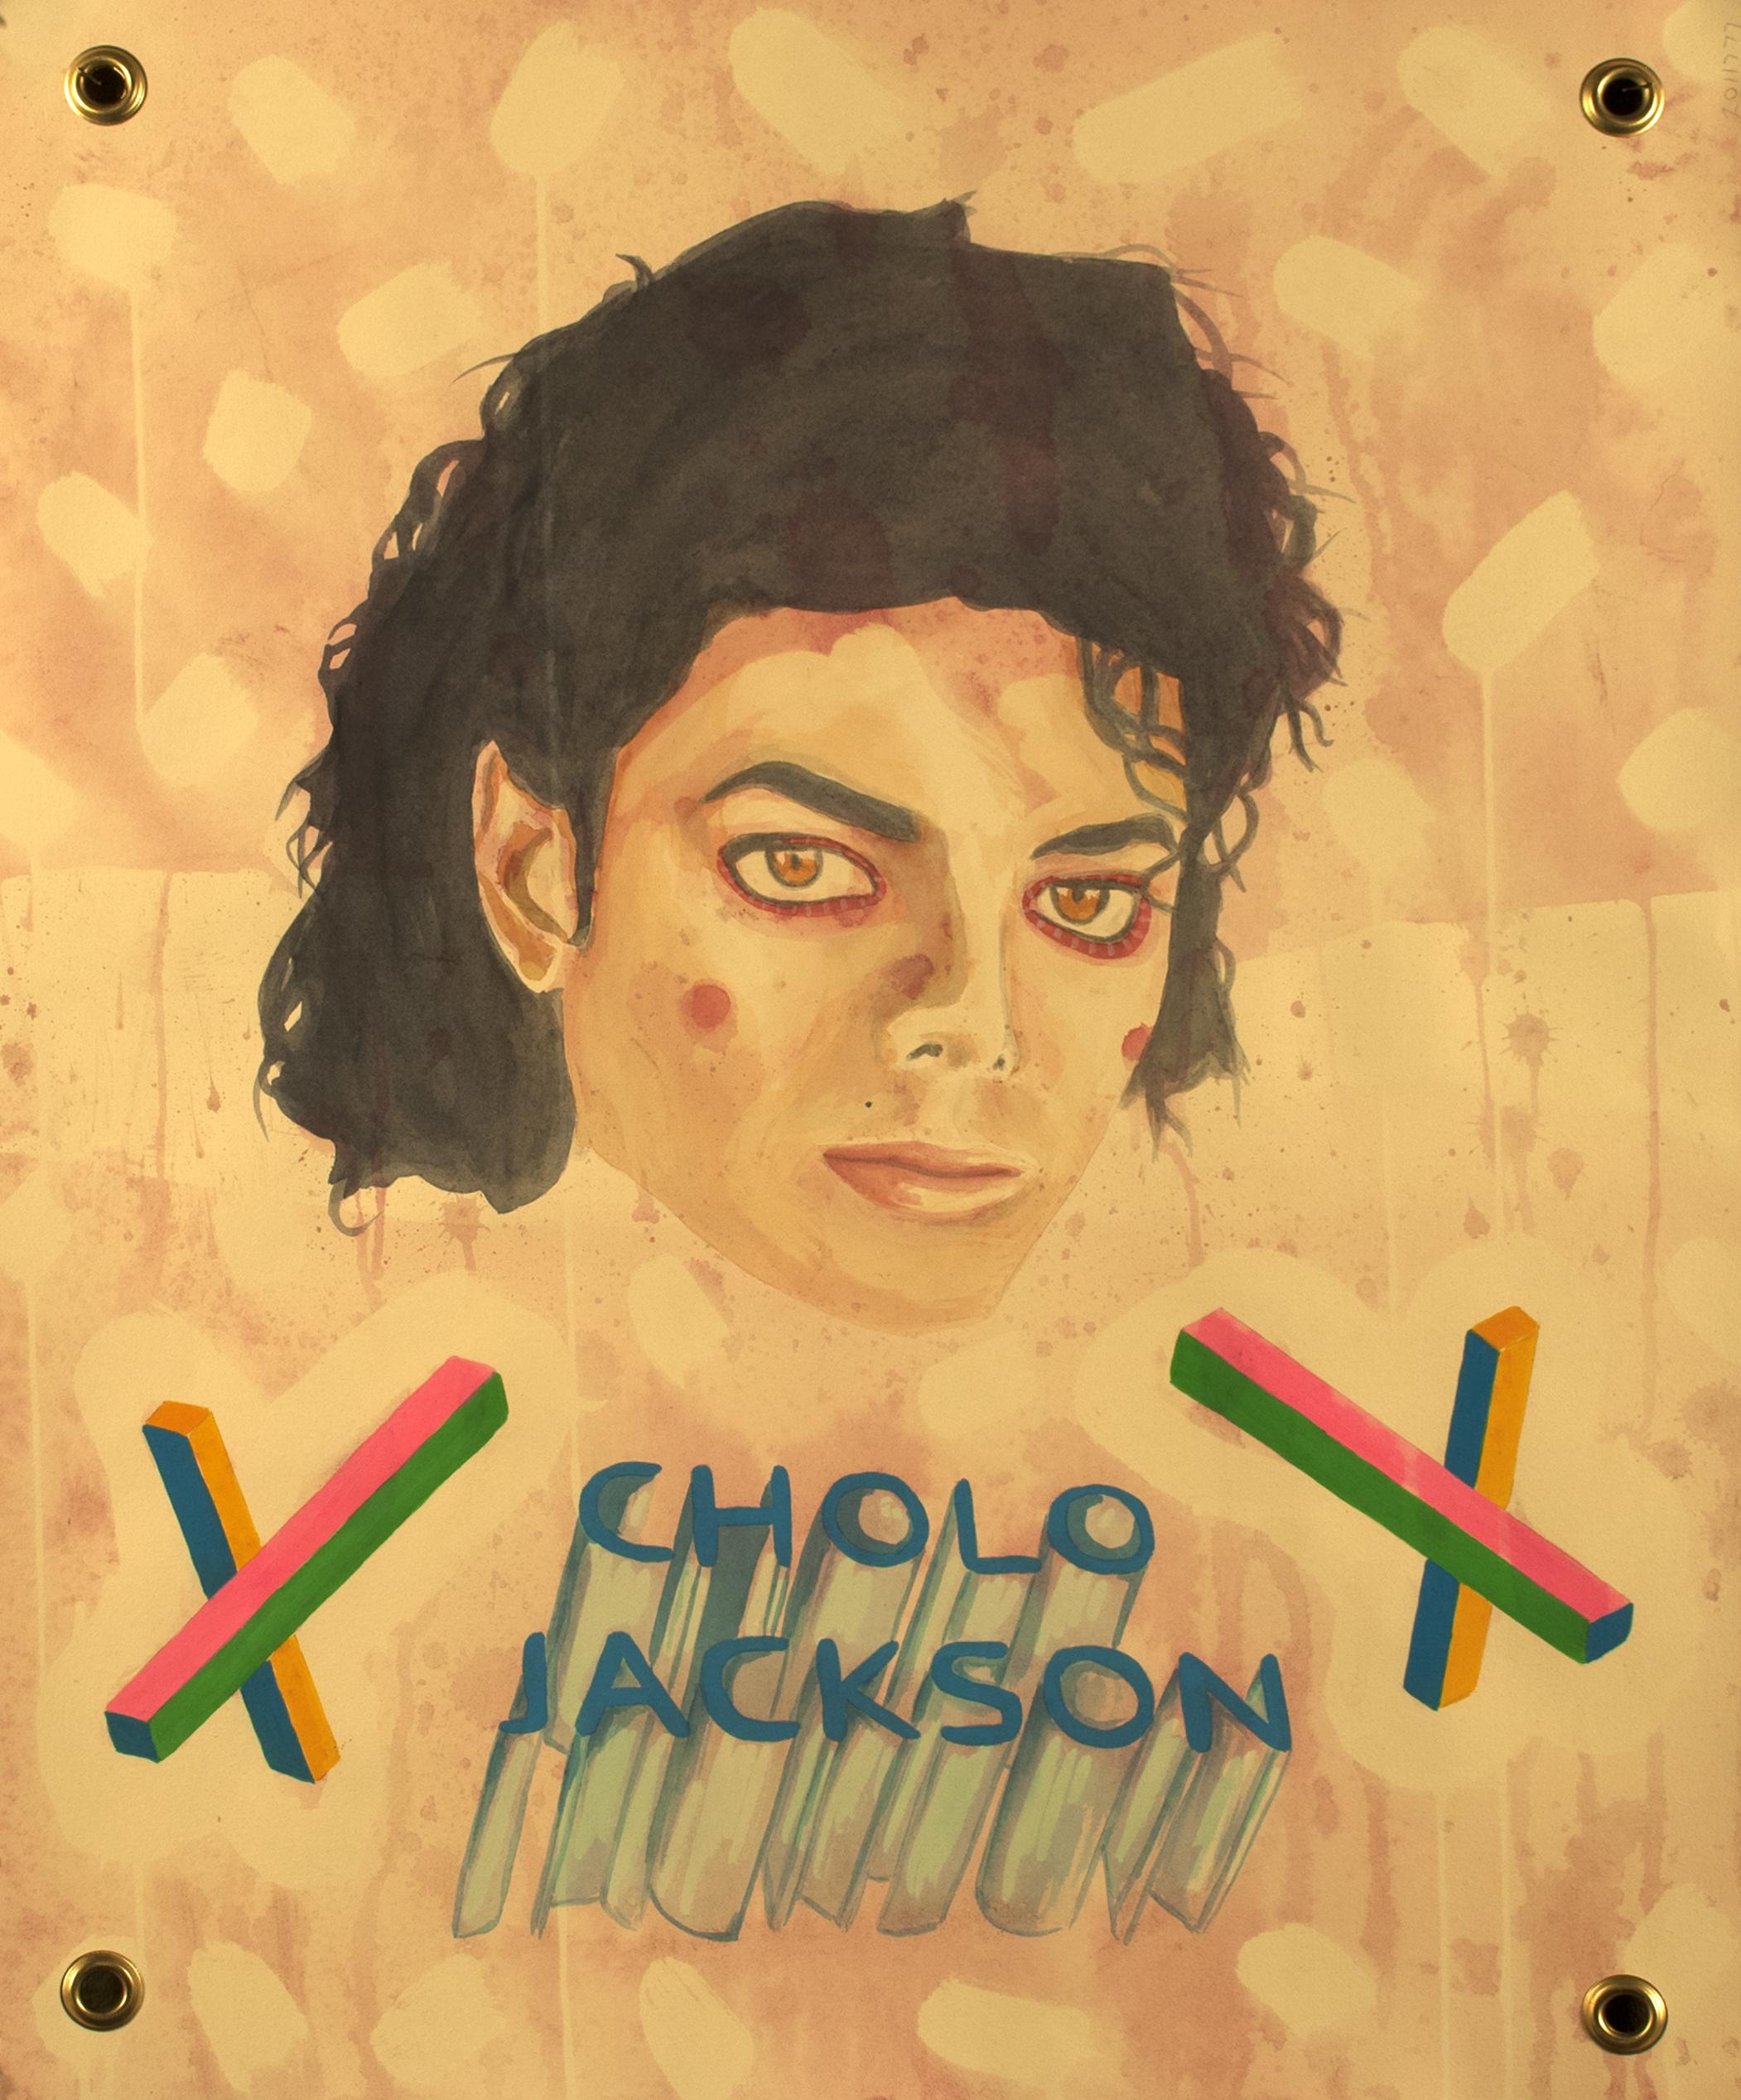 Teen Fanclub Cholo Jackson